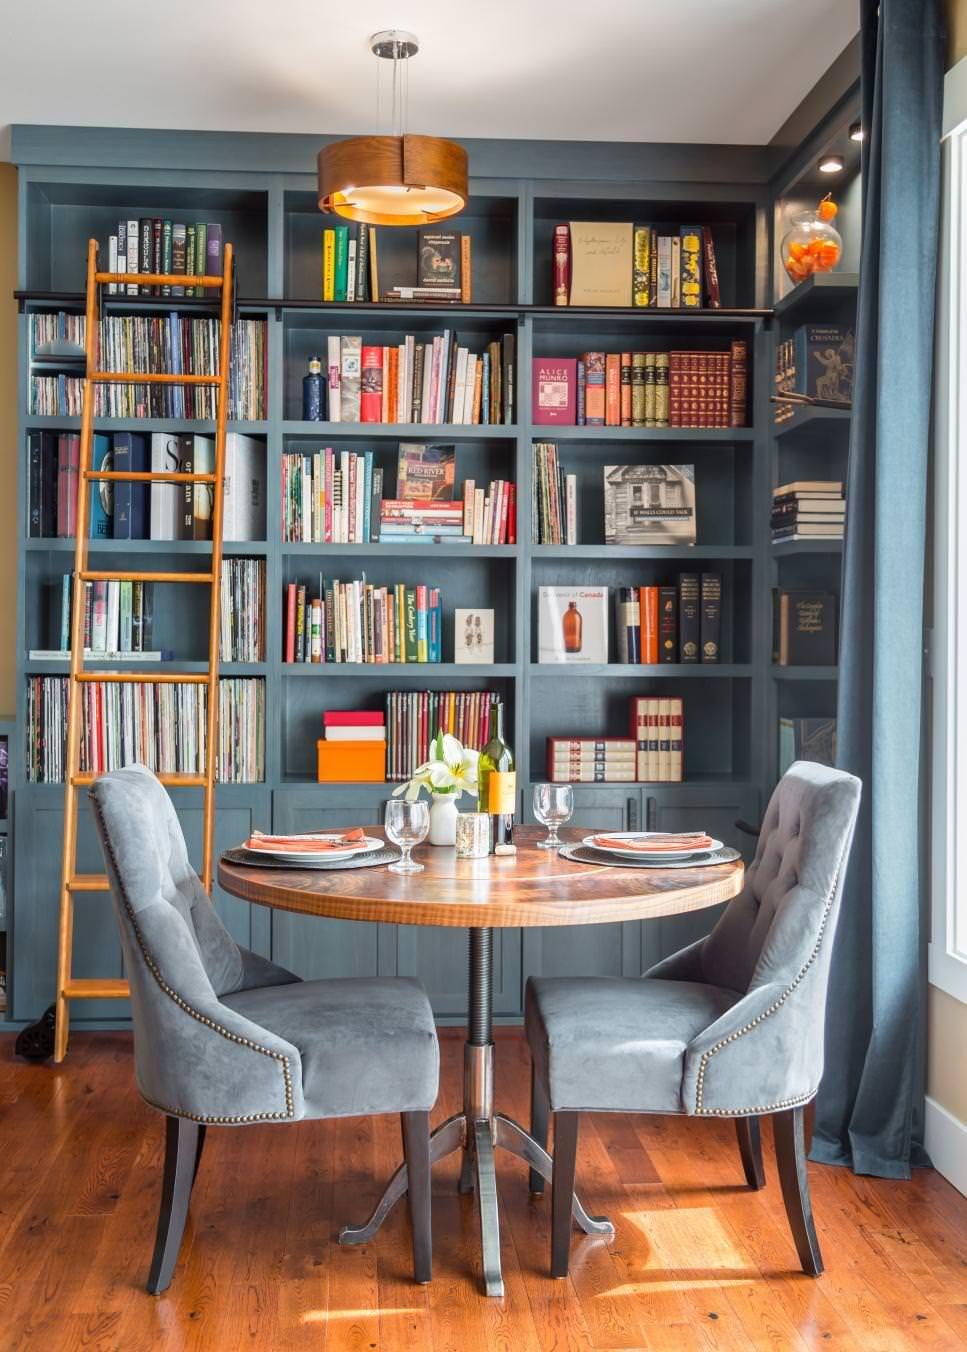 Pintally Eyal On Living Space  Pinterest  Small Dining Prepossessing Living Room Library Design Inspiration